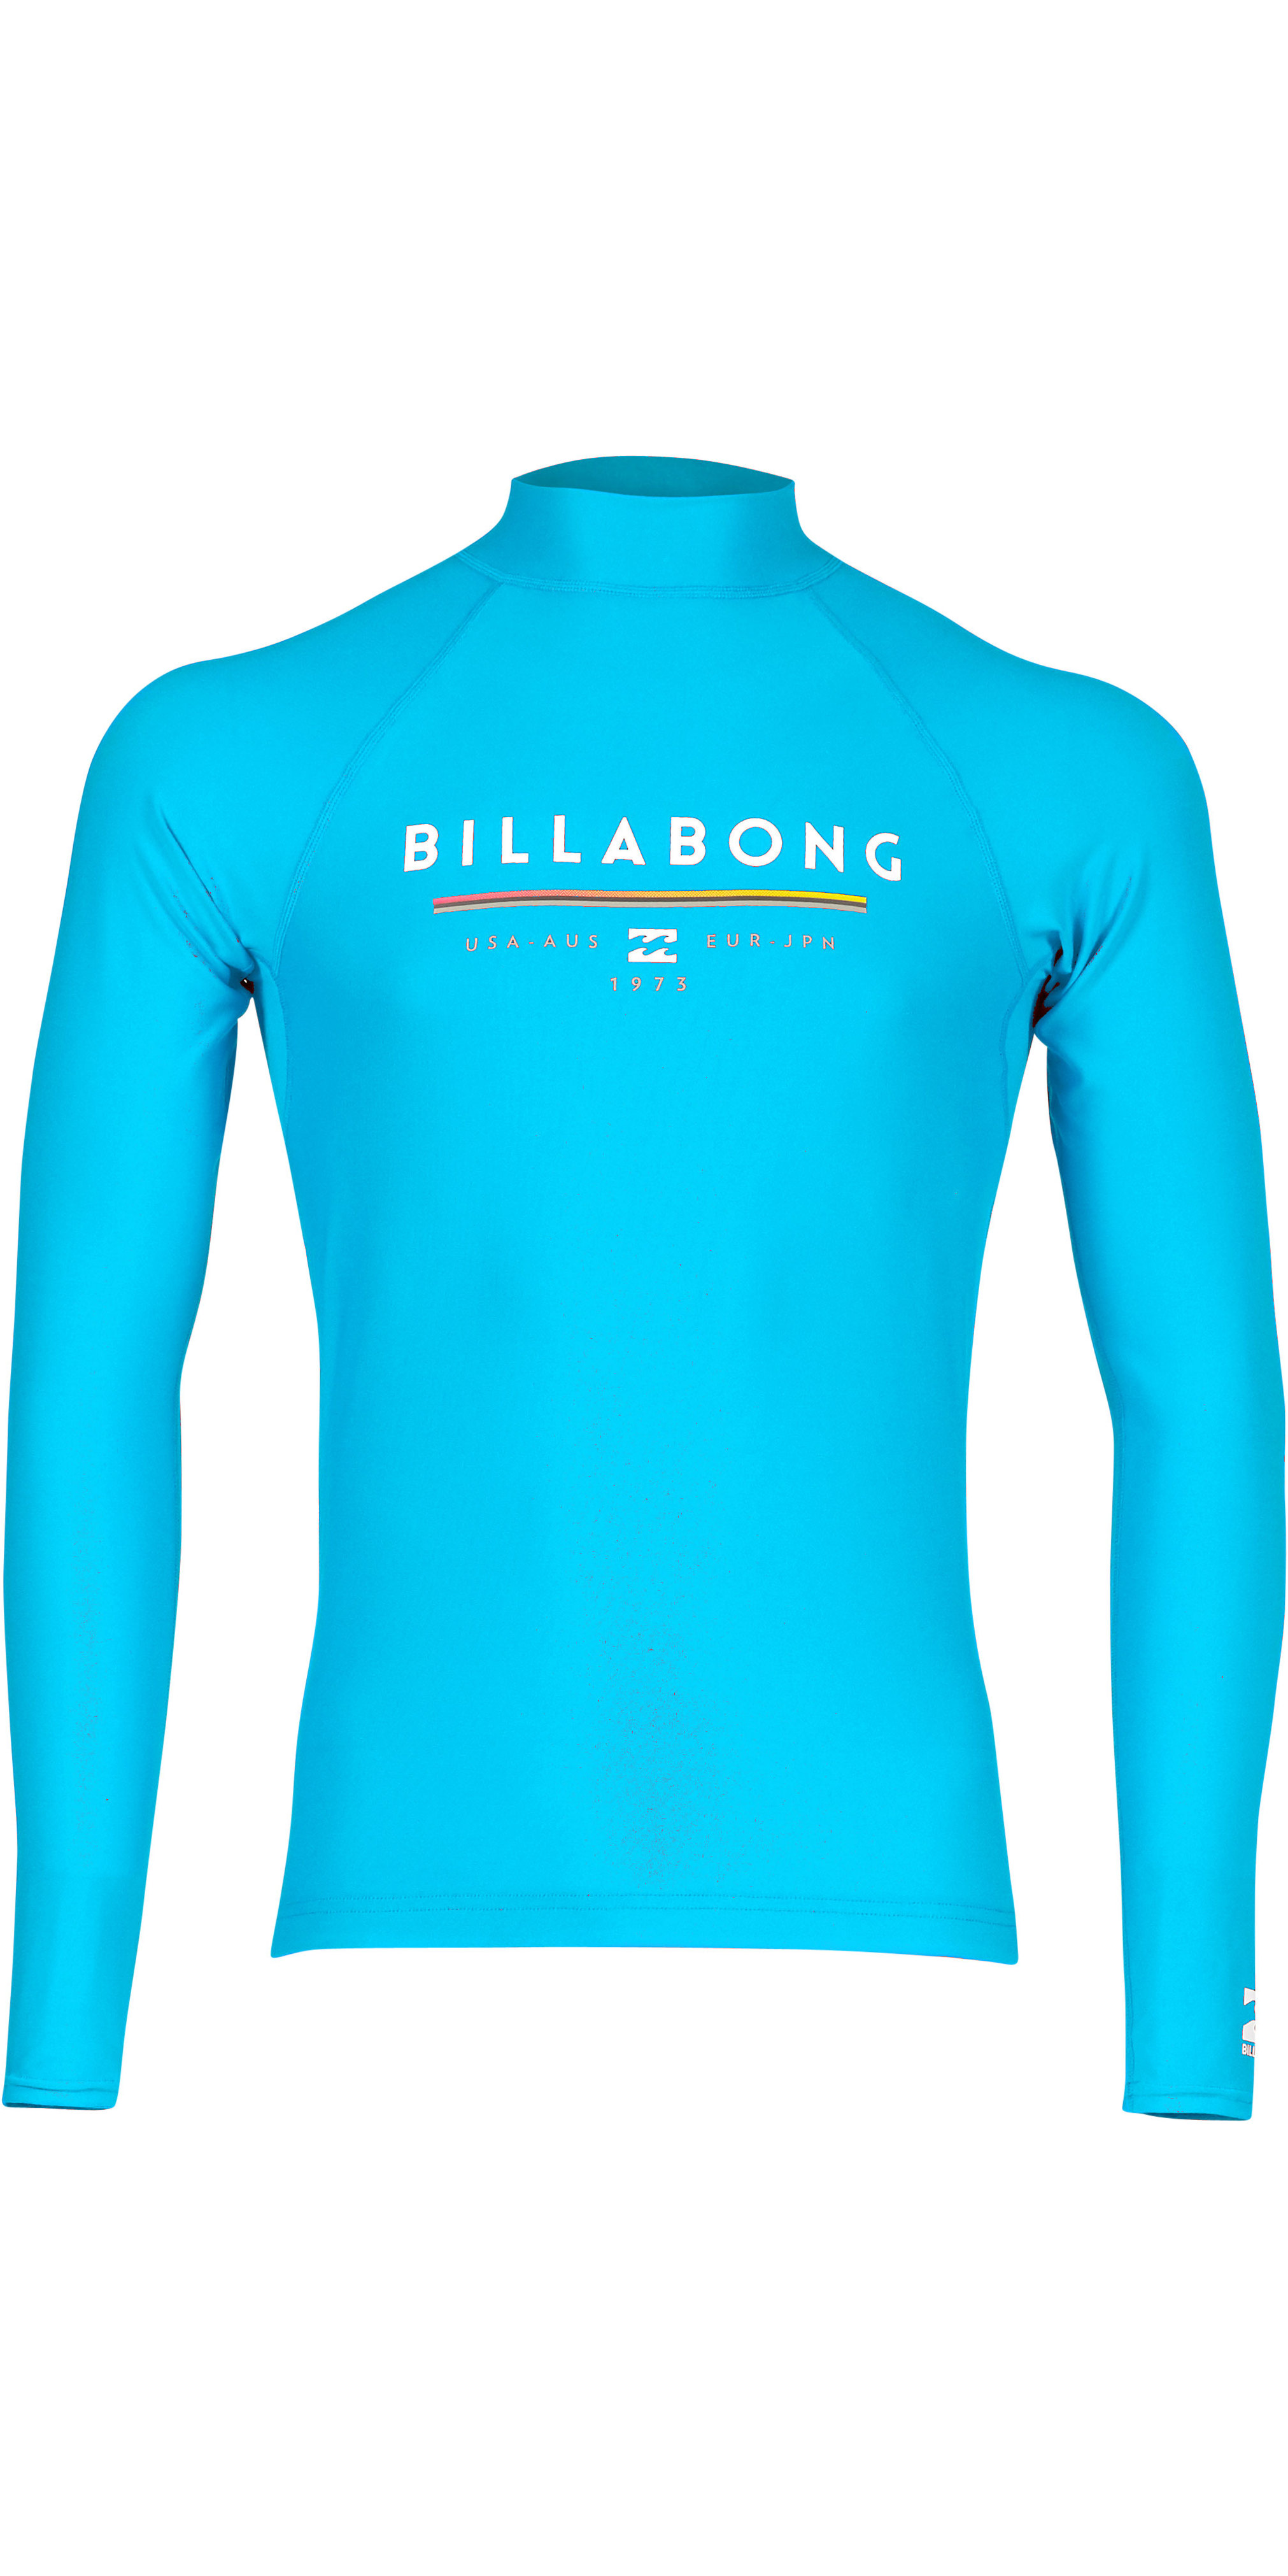 e9b48fe20c 2019 Billabong Junior Boys Unity Long Sleeve Rash Vest Artic N4ky10 - Long  Sleeve Rash Vests   Wetsuit Outlet